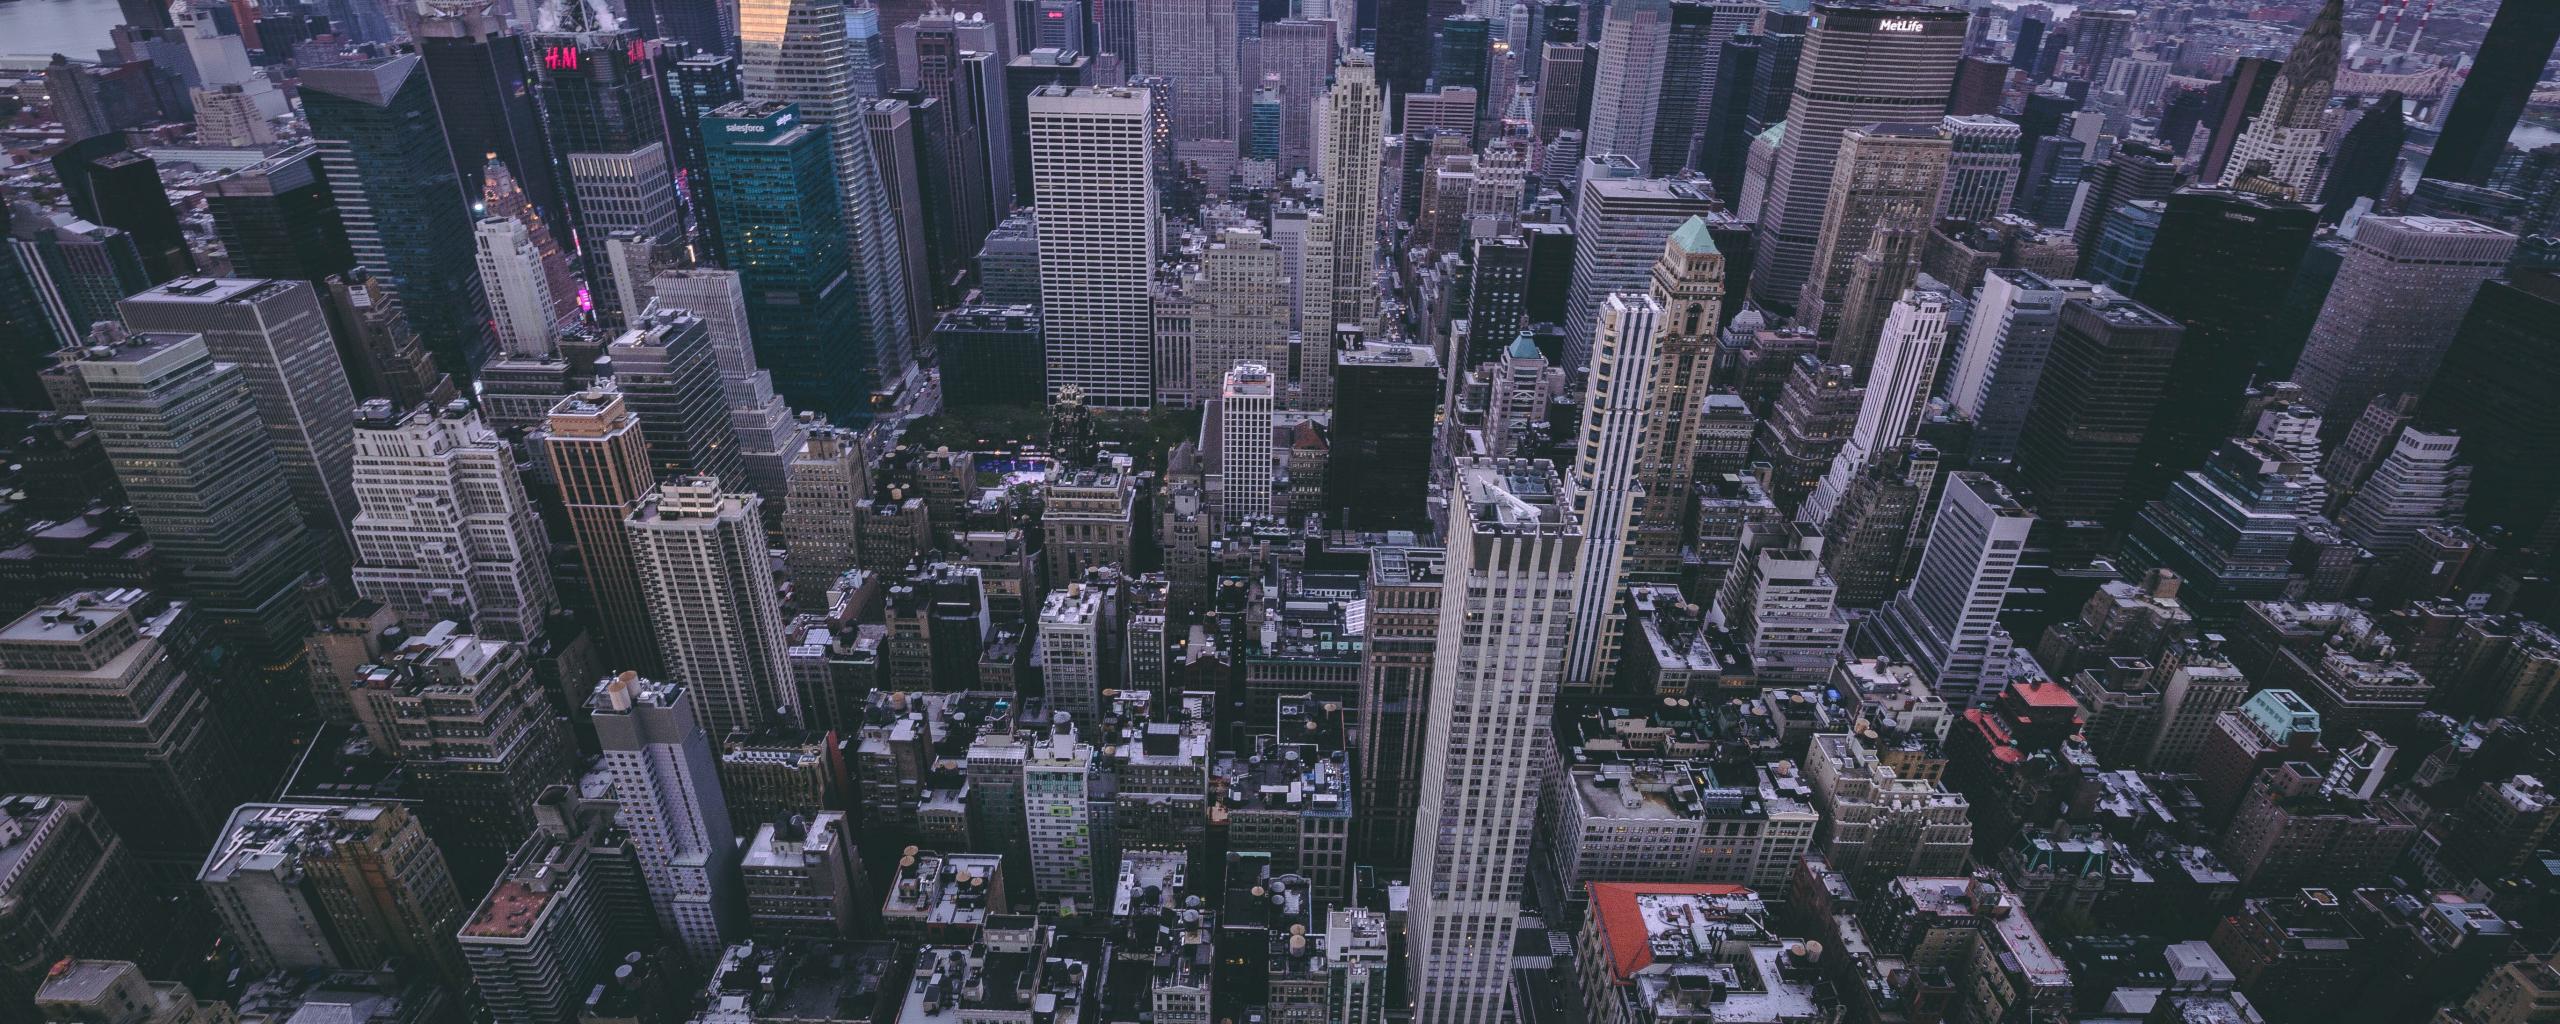 New york city buildings aerial view 5k